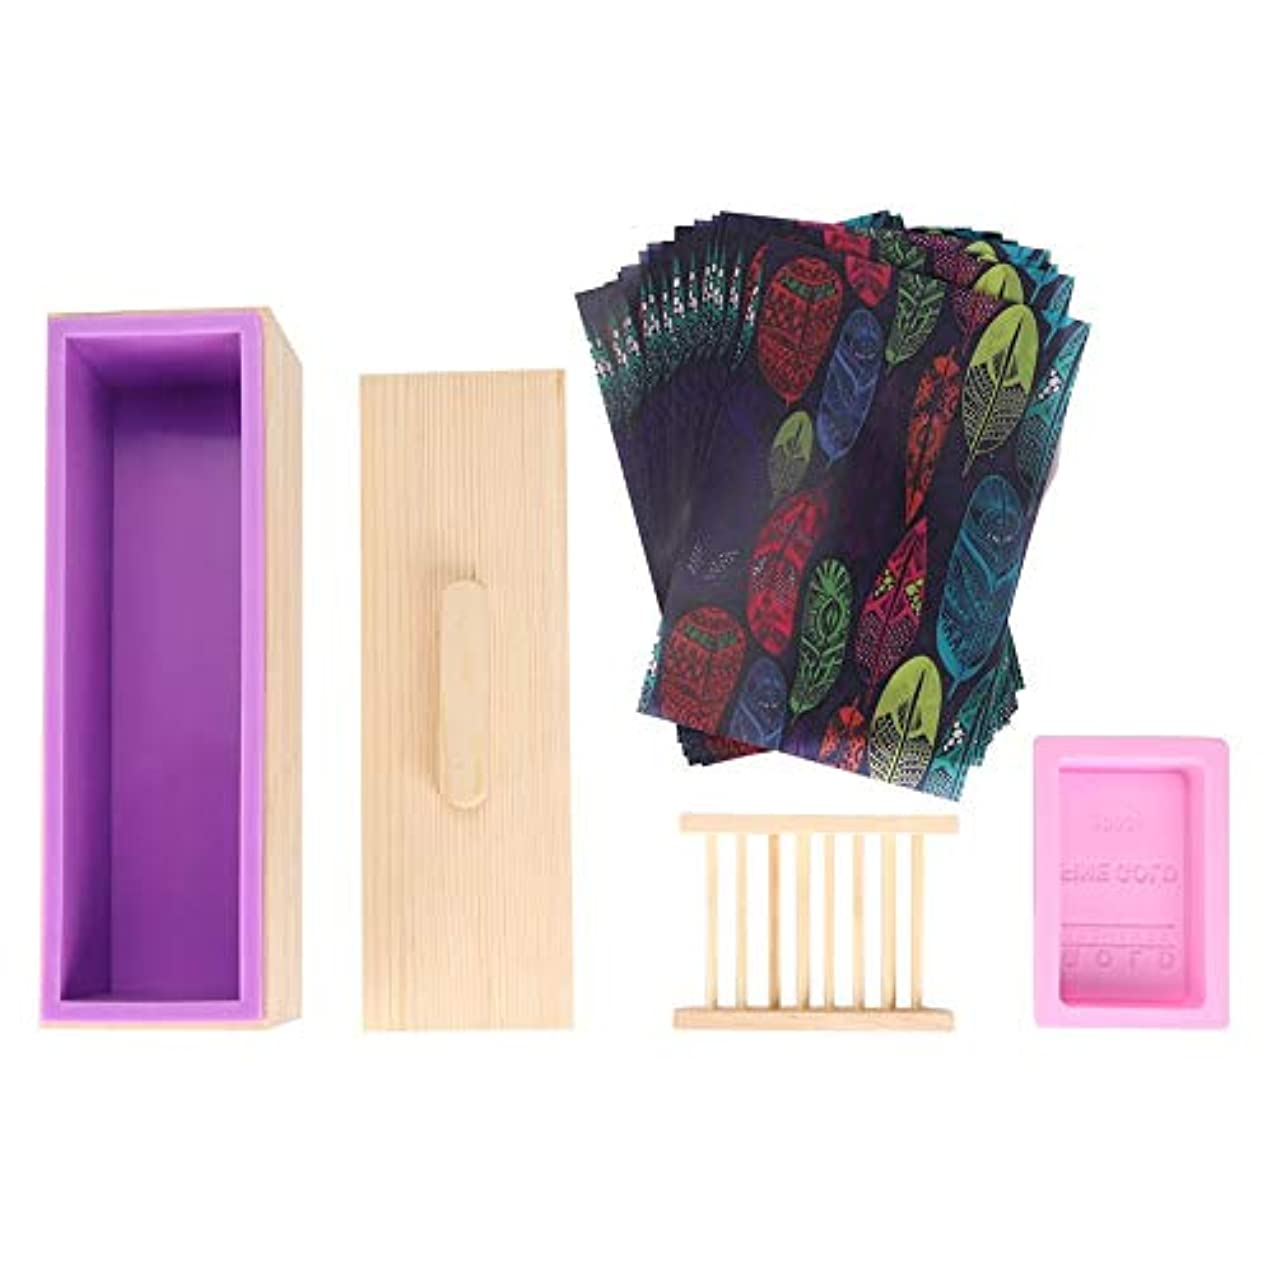 Salinr ソープカッター 石けん金型ソープロープ カッター 紫色のシリコントースト木箱 石鹸カッターモールド石鹸ロープモールド カッター ソープカッターボックス家庭用ツール ツールDIY 手作り